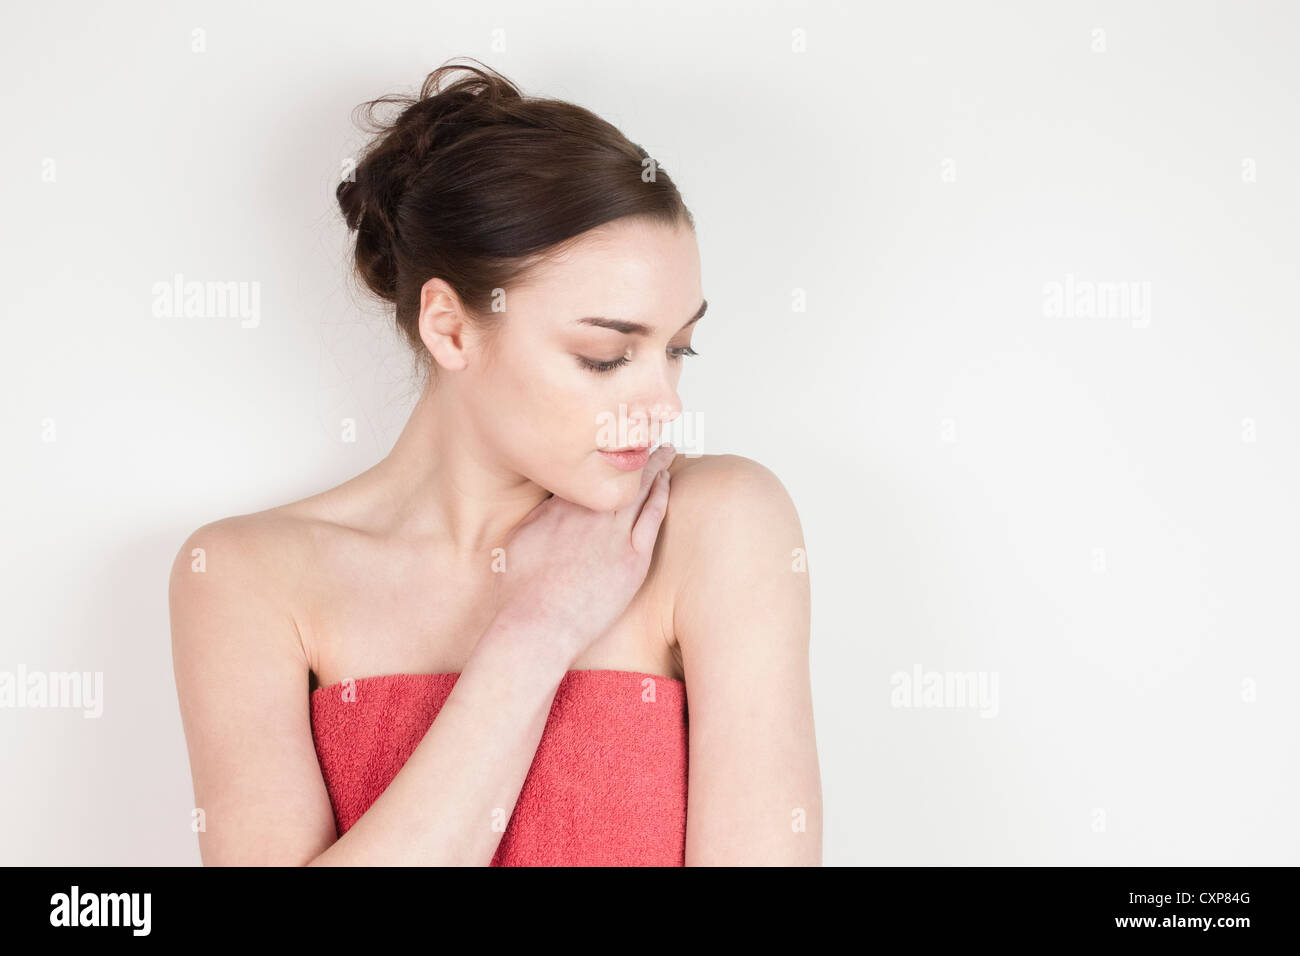 Woman wearing a bath towel - Stock Image